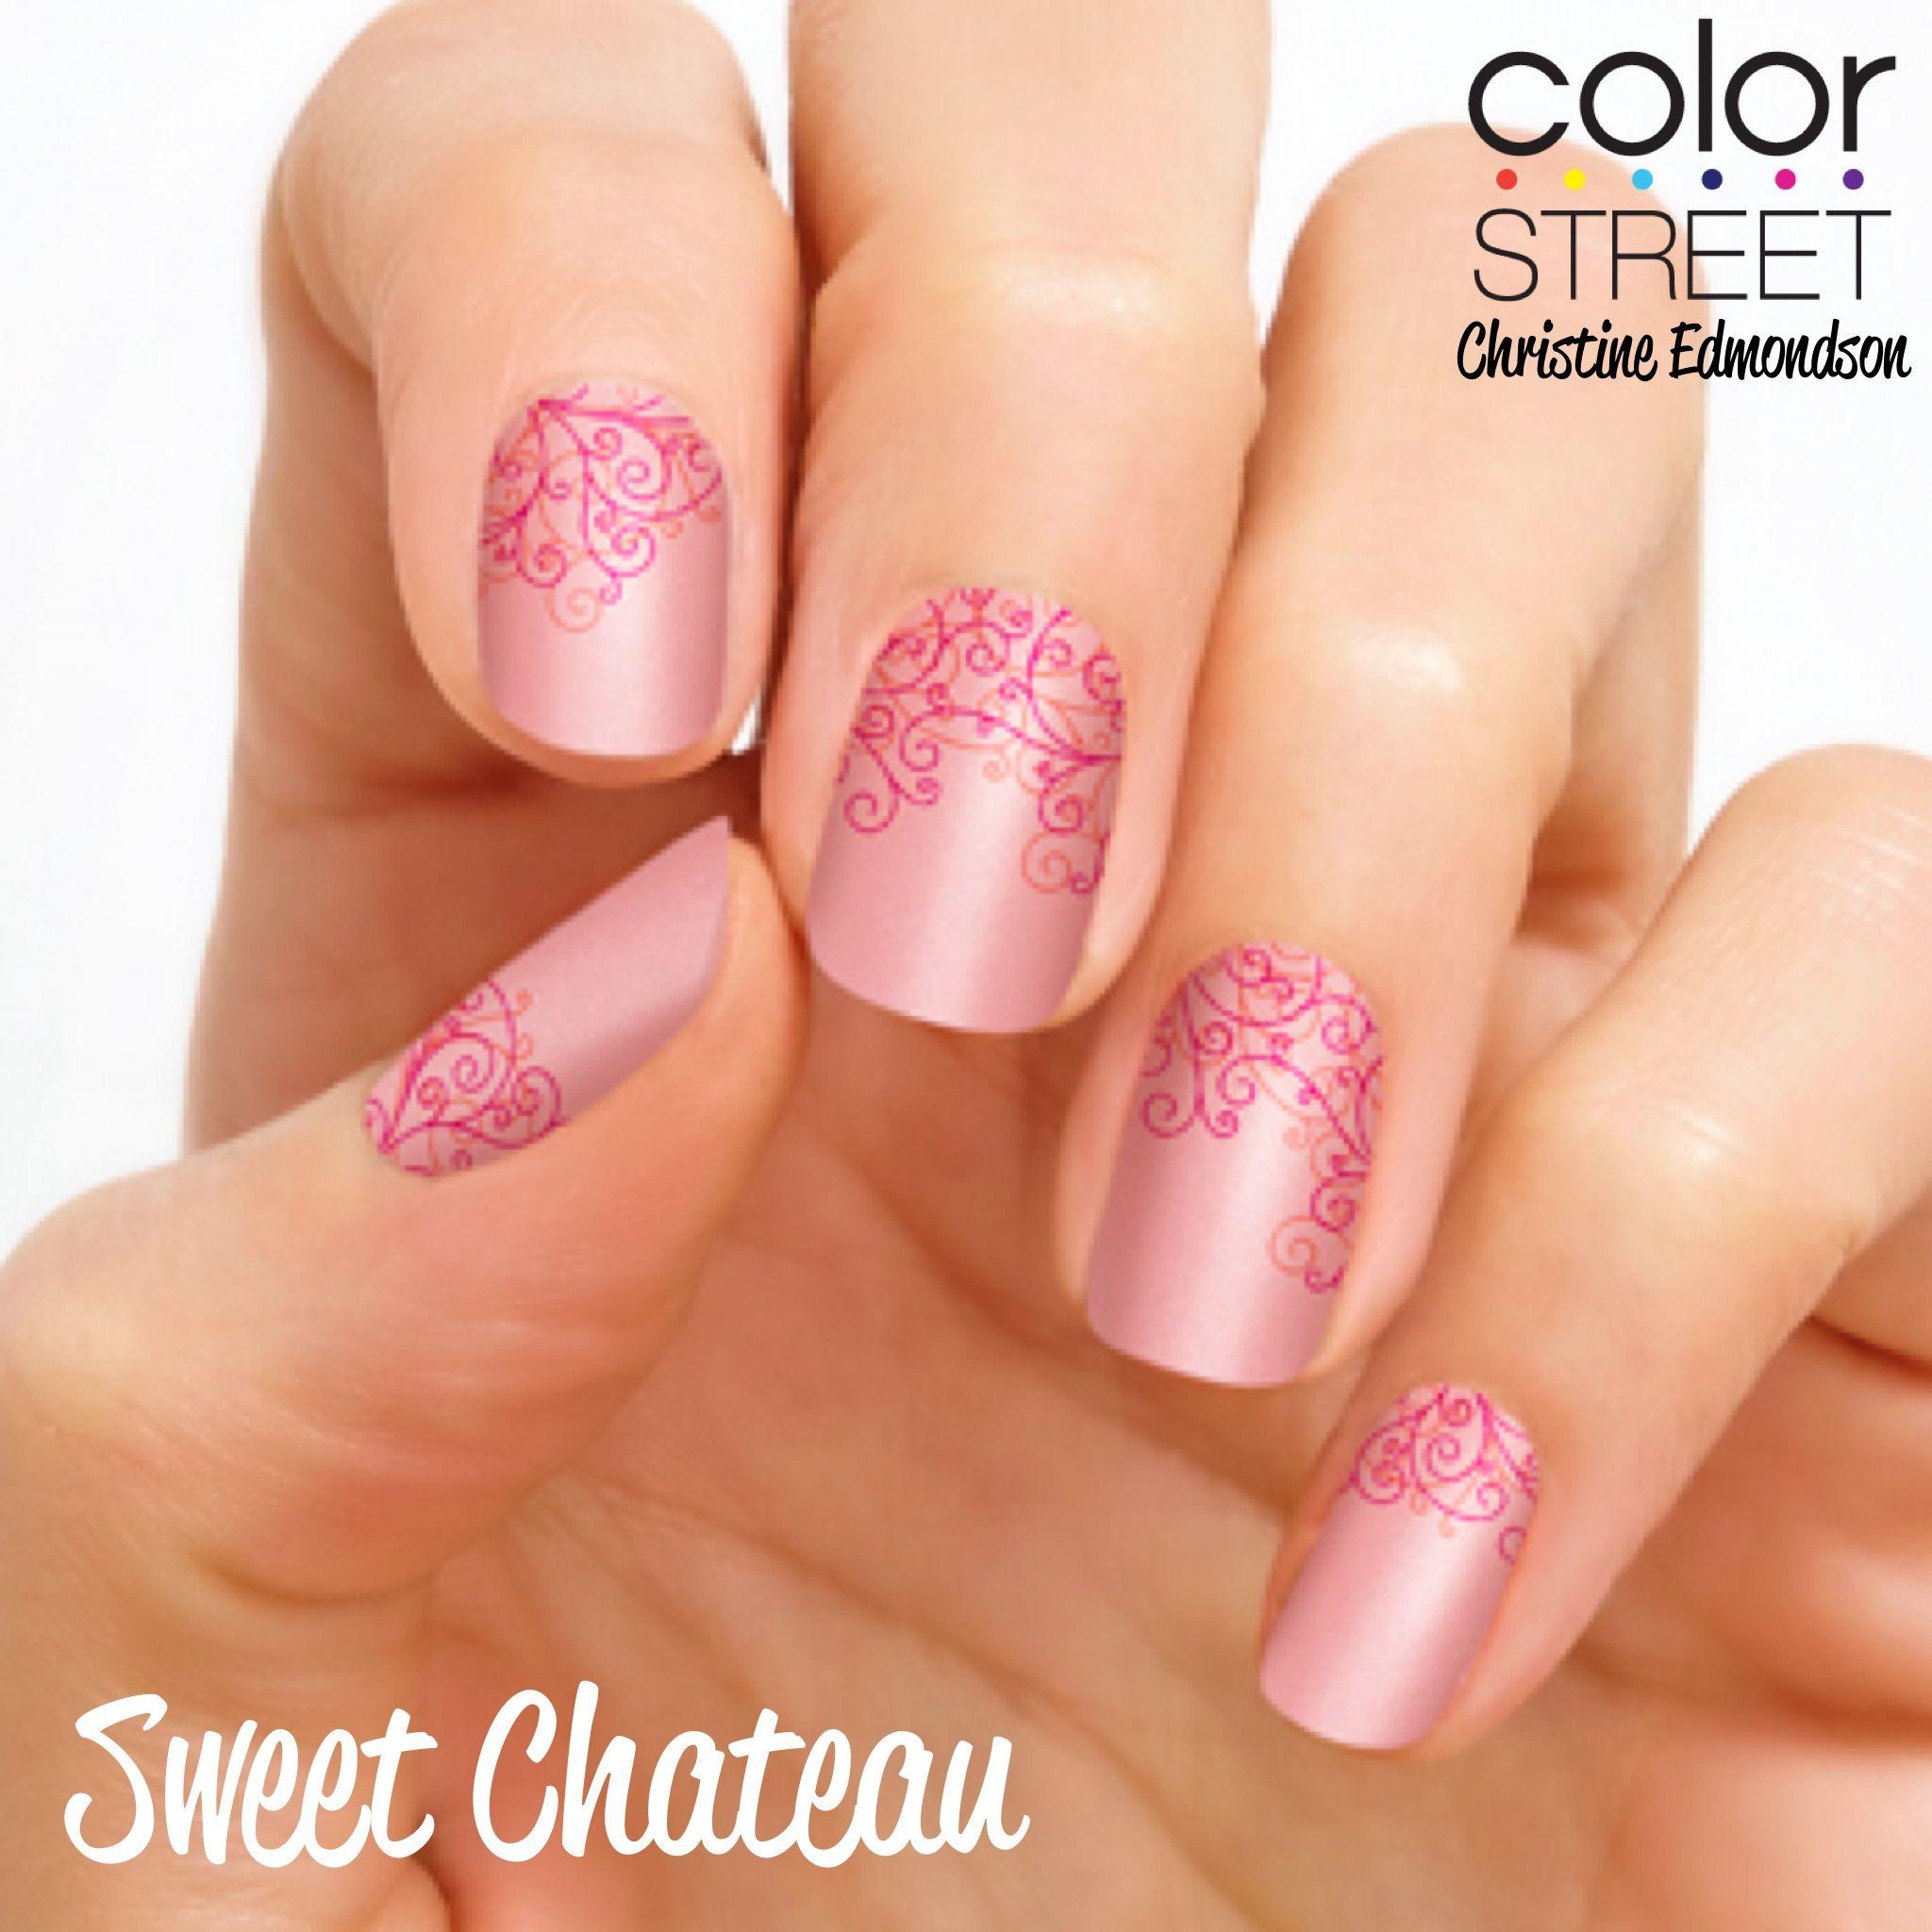 Sweet Chateau - 100% nail polish strips that require NO tools, NO ...